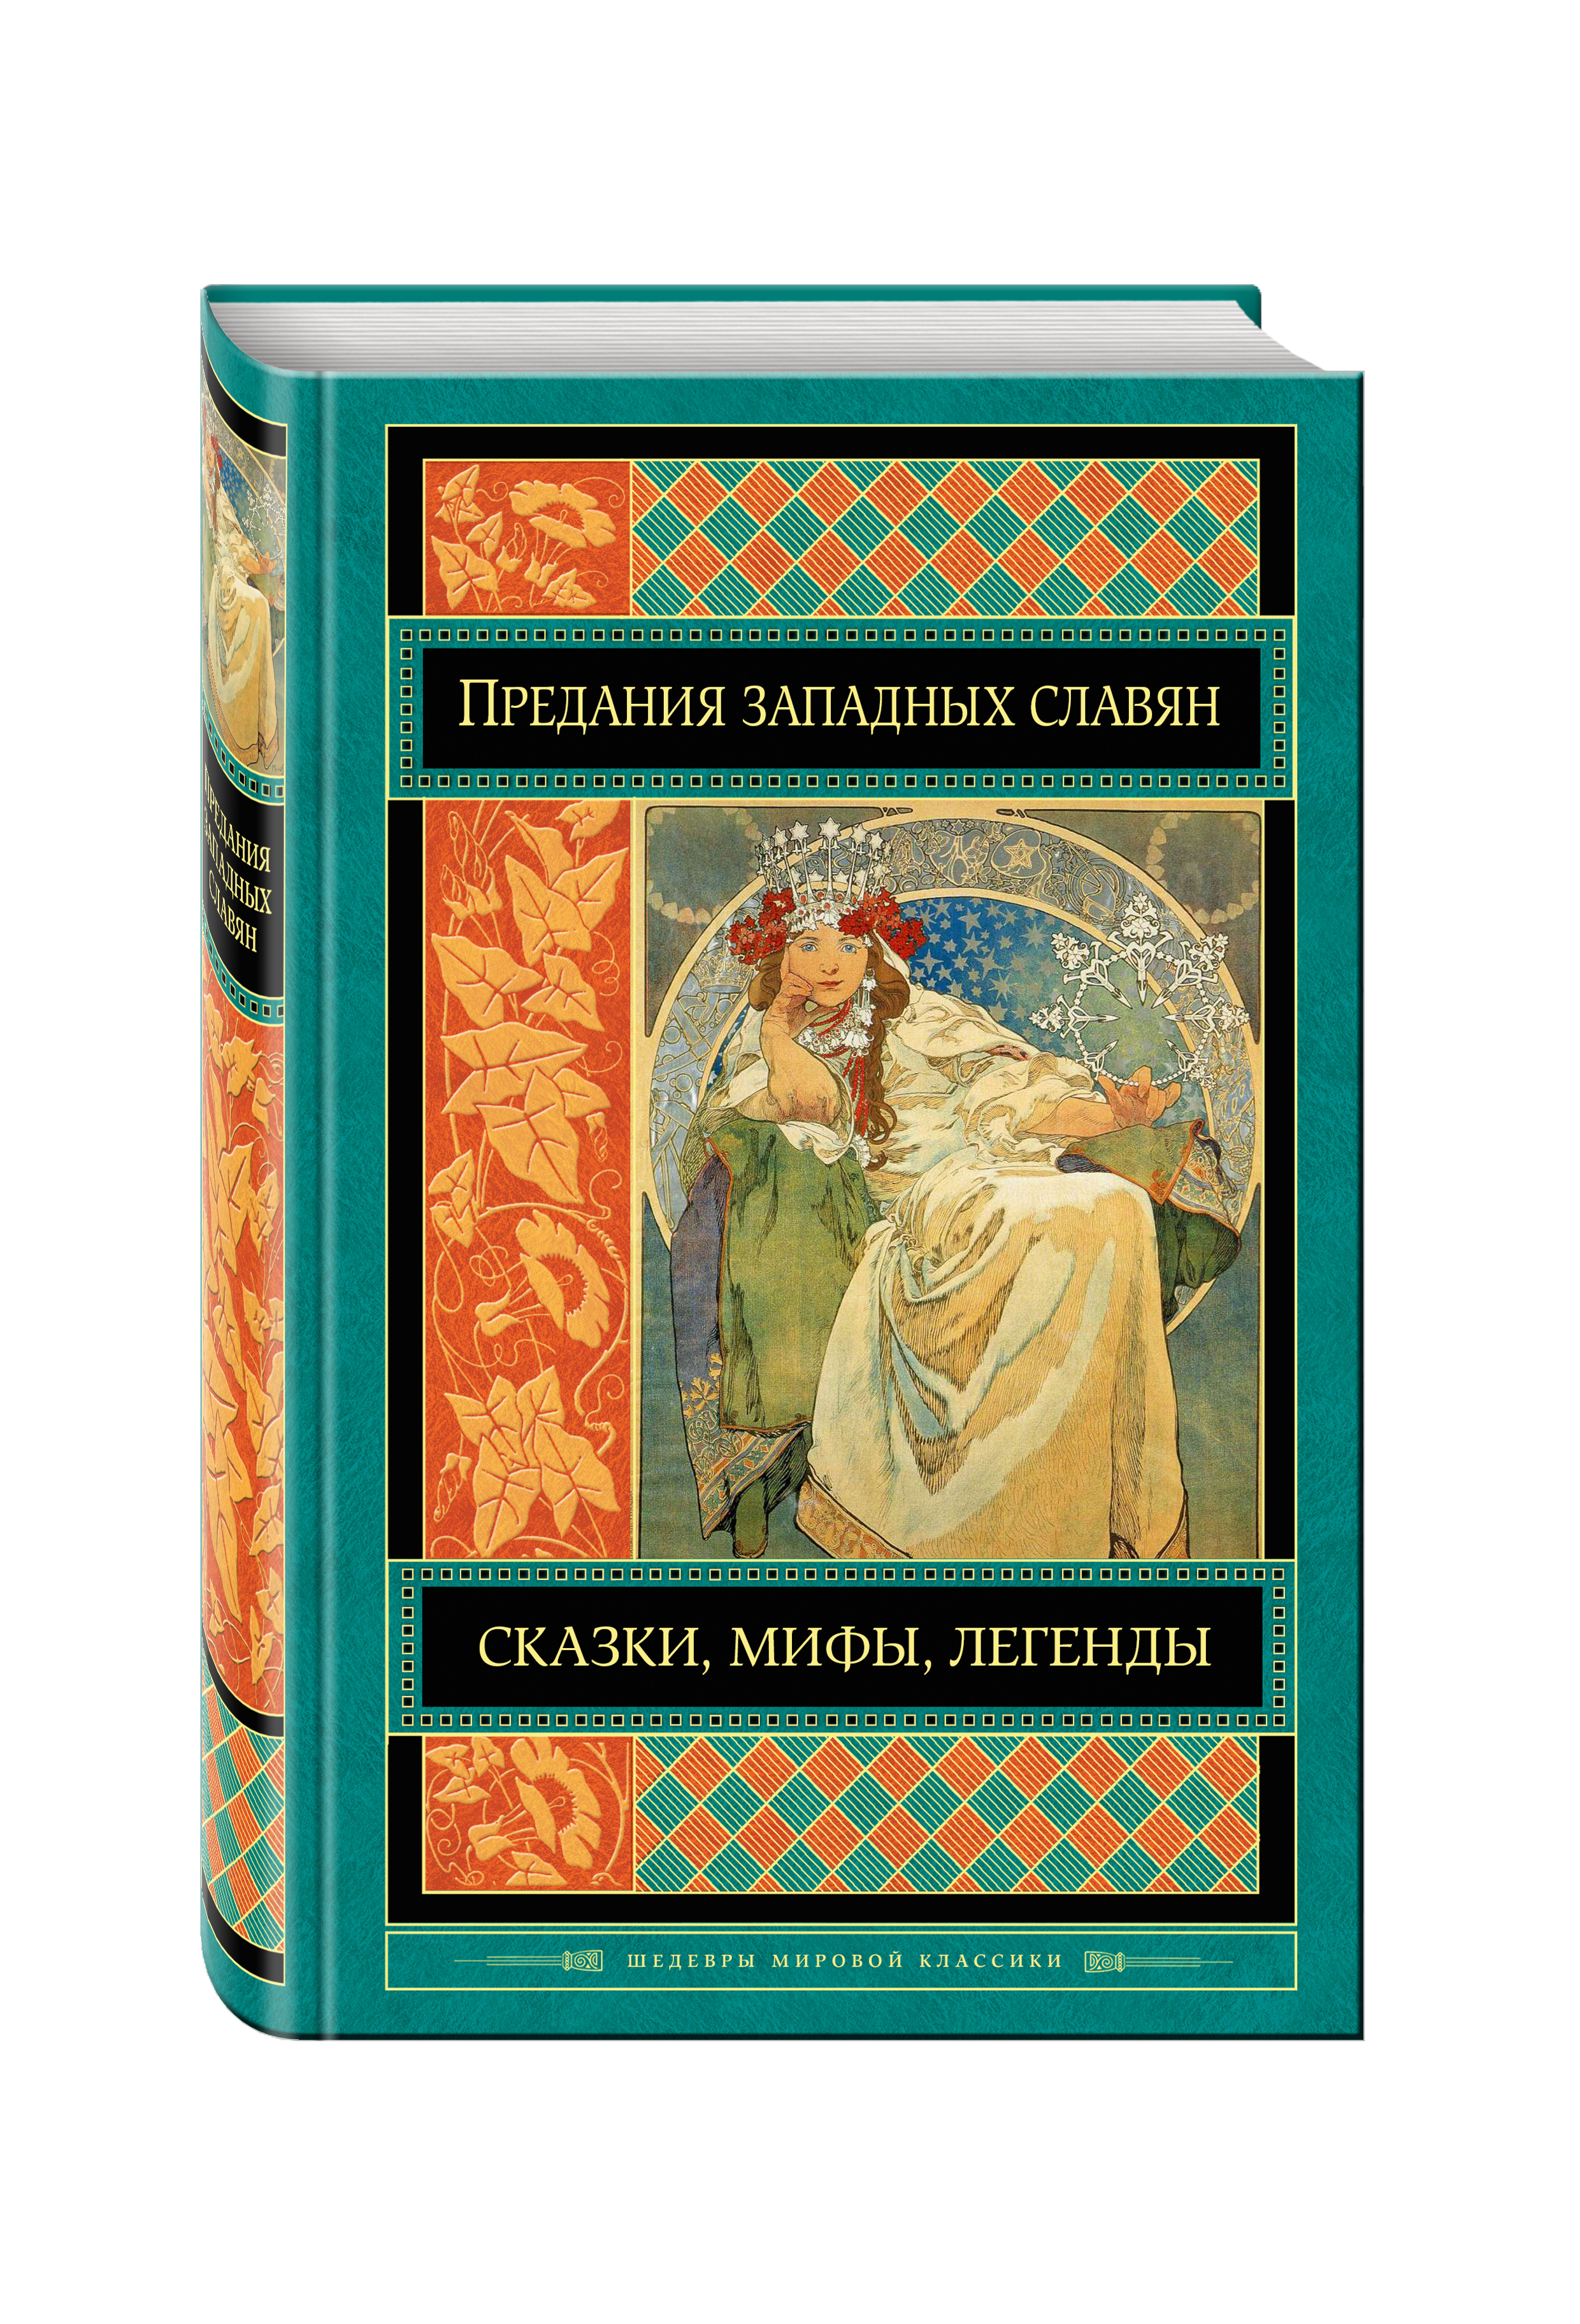 Предания, сказки и мифы западных славян от book24.ru